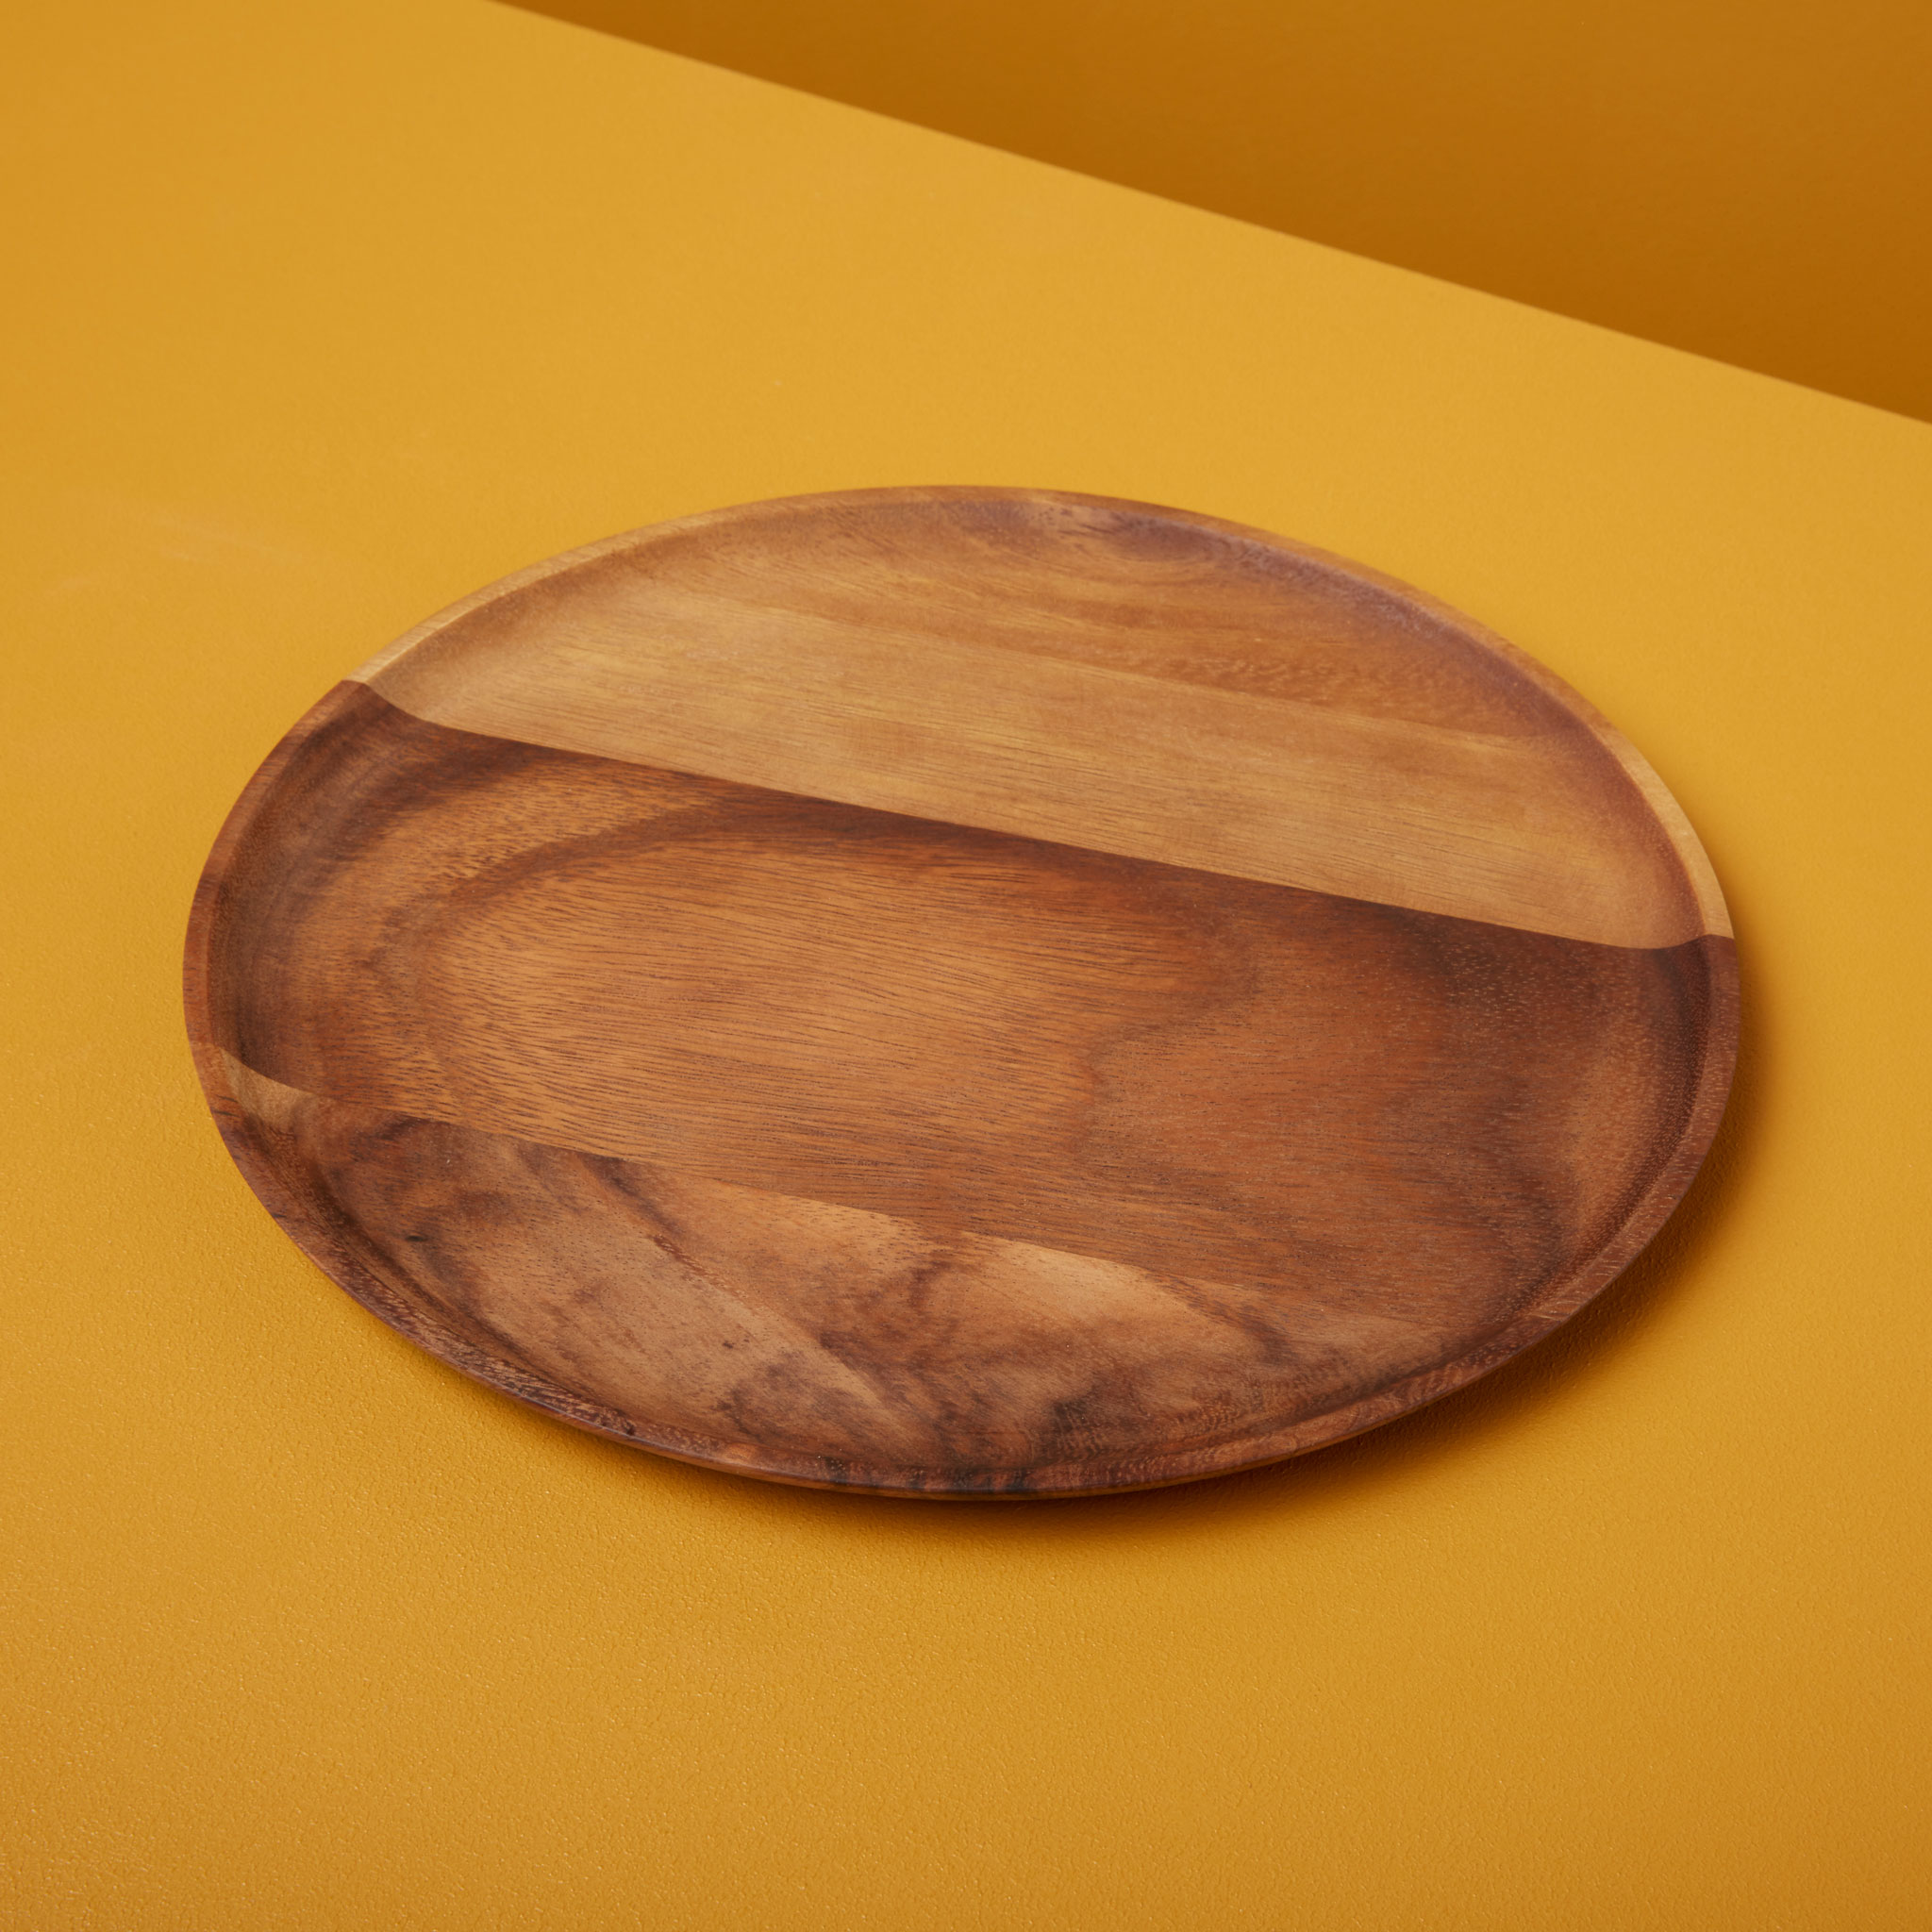 Be-Home_Acacia-Round-Plate-Medium_41-02